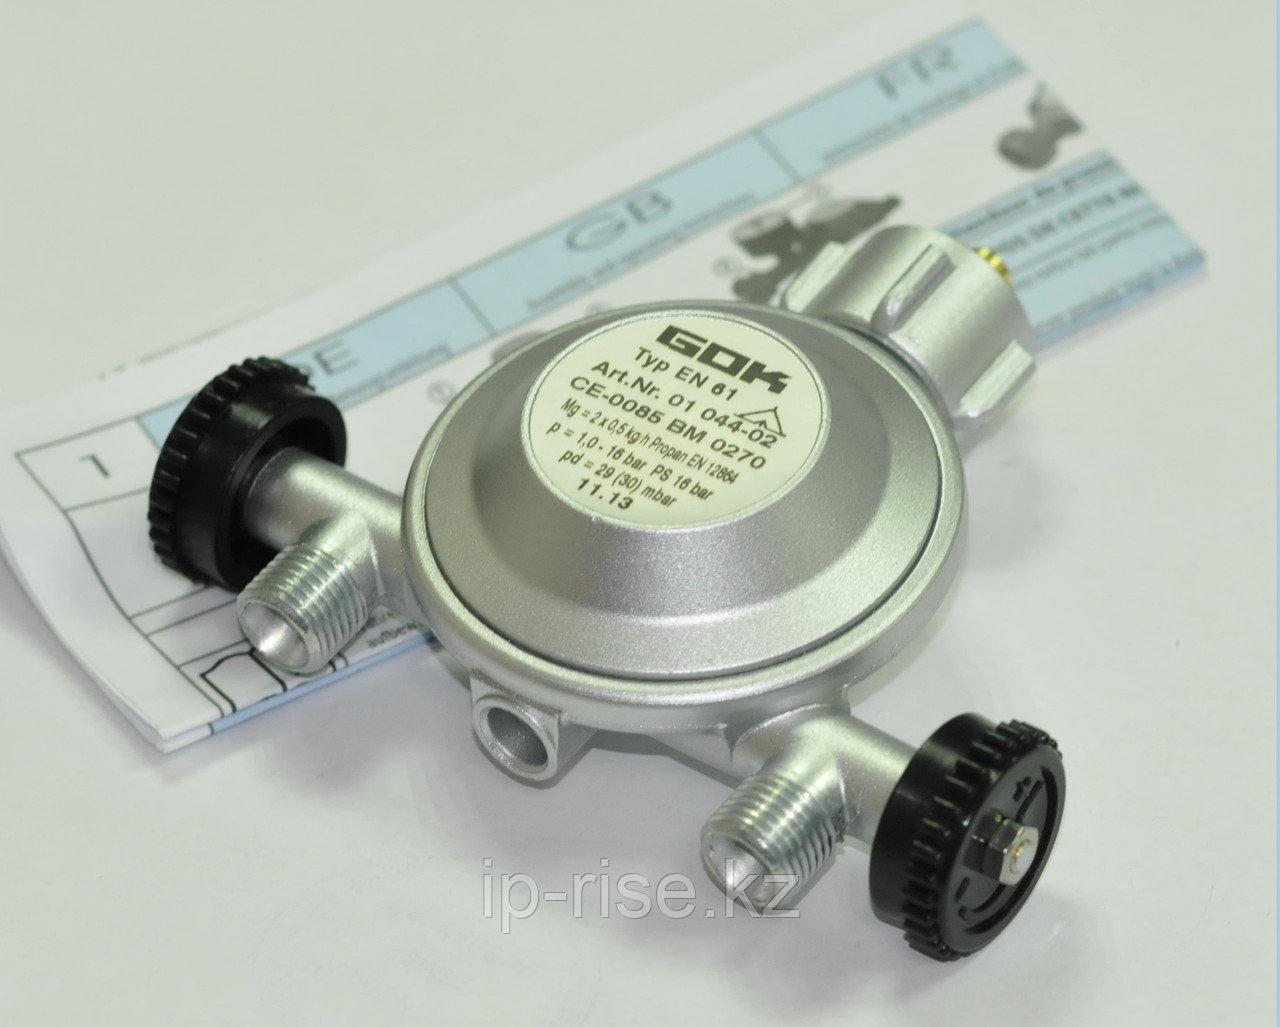 Регулятор давления газа 1,5кг/час 29(30)мбар PS16бар Komb.A x G1/4LH-KN UEDS Man